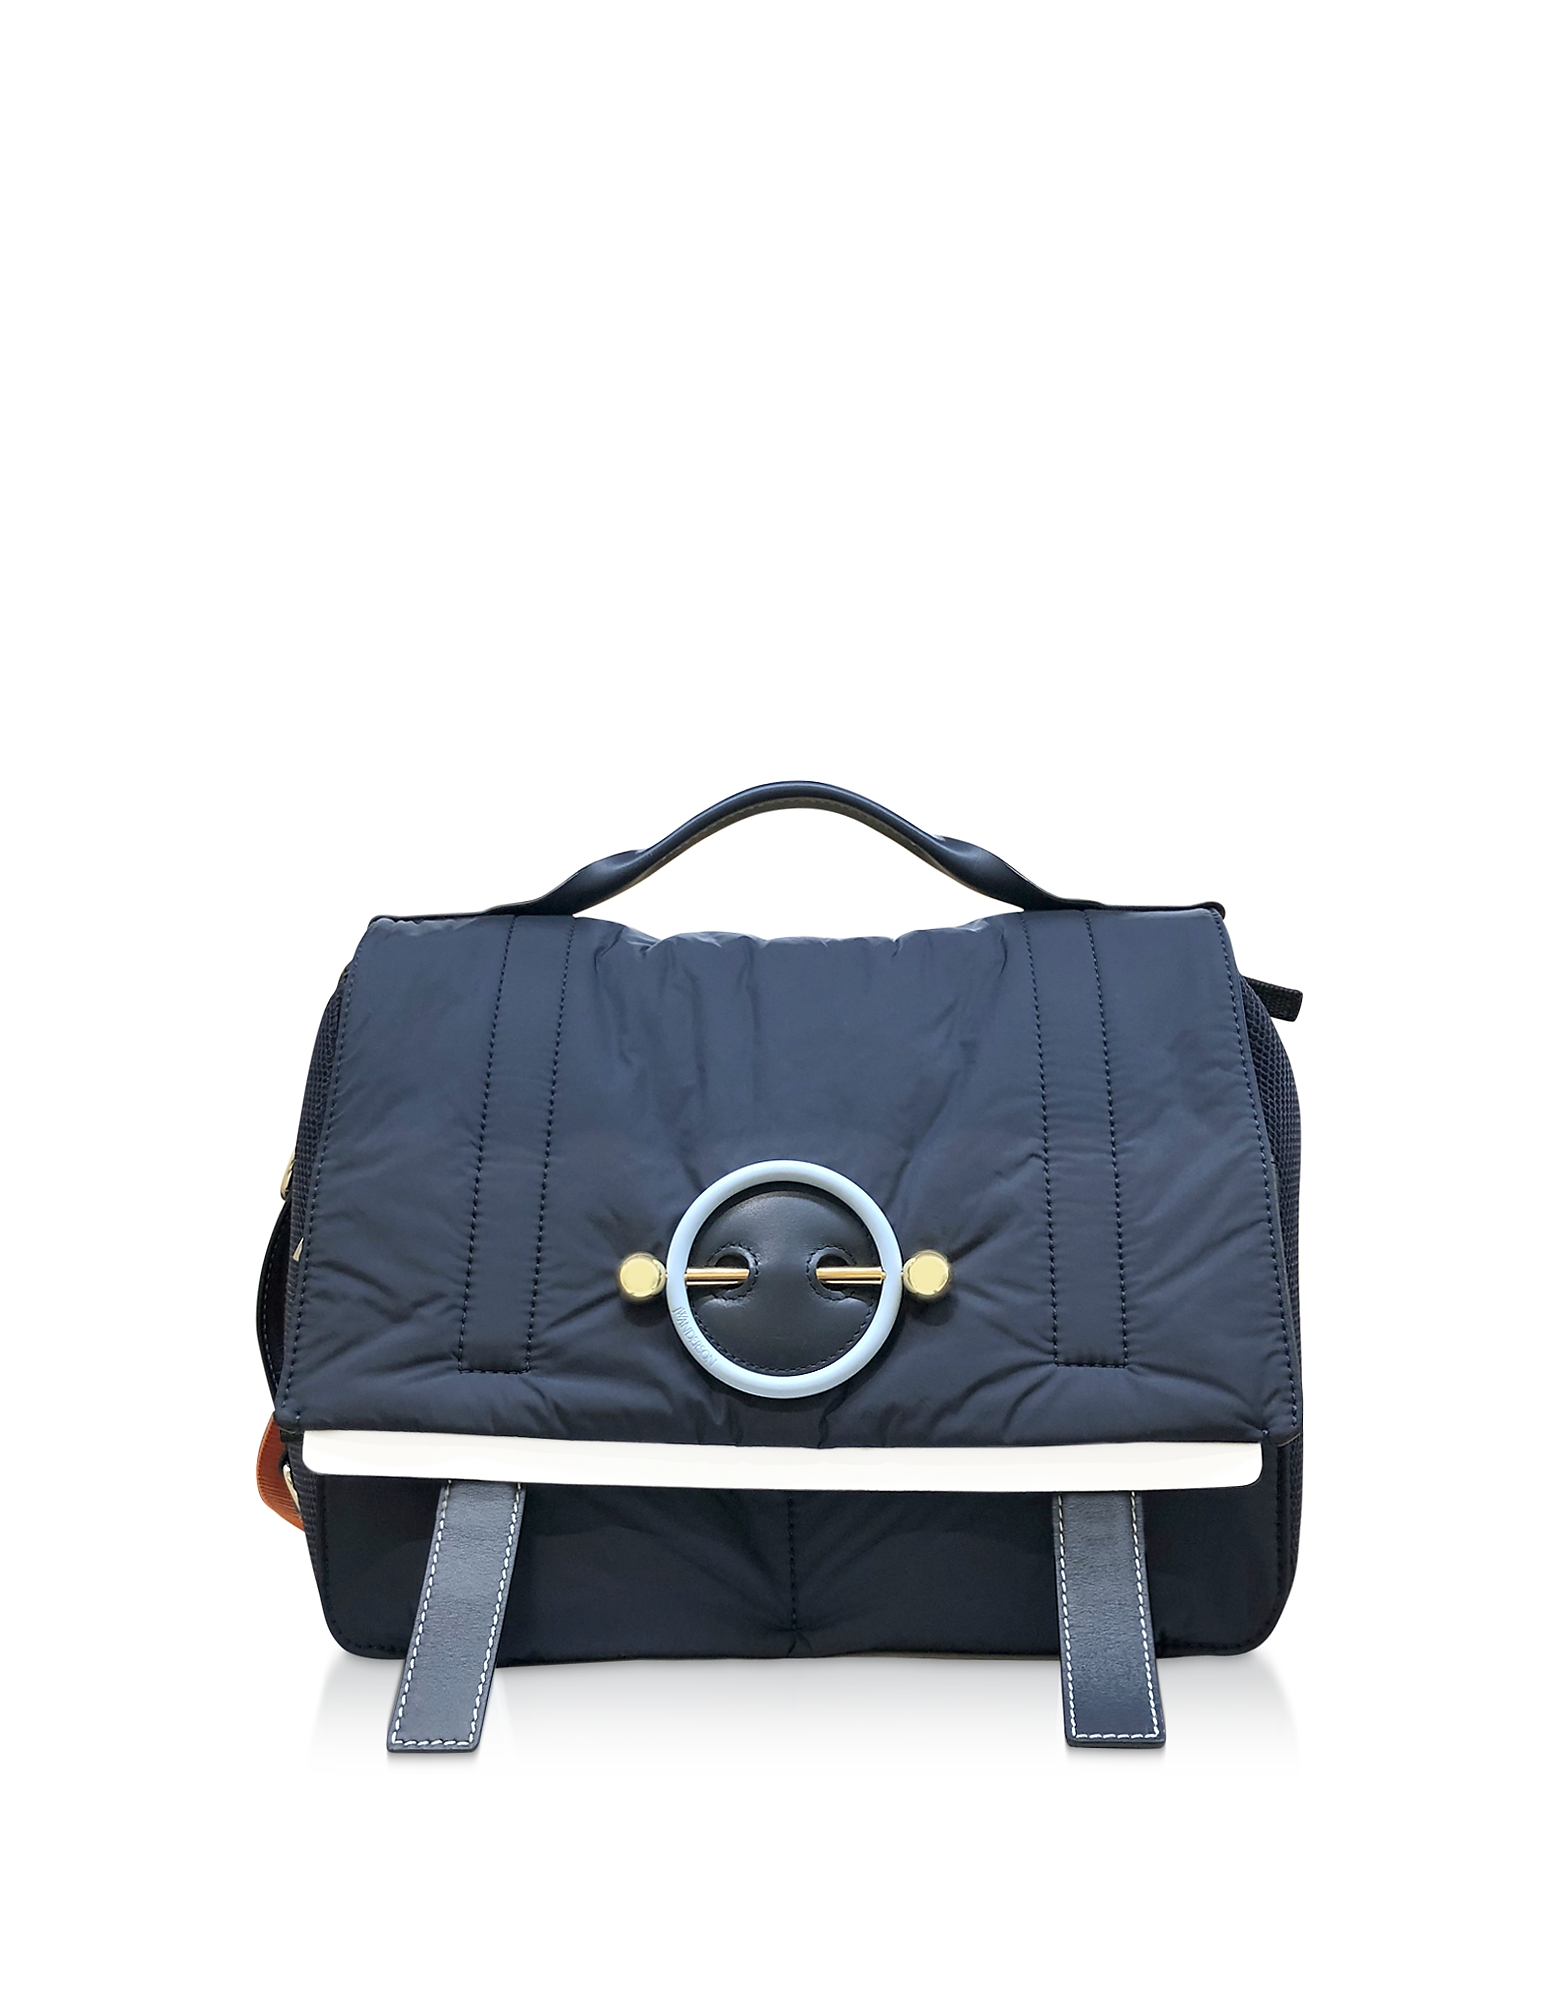 JW Anderson Designer Handbags, Navy Blue Nylon Satchel bag